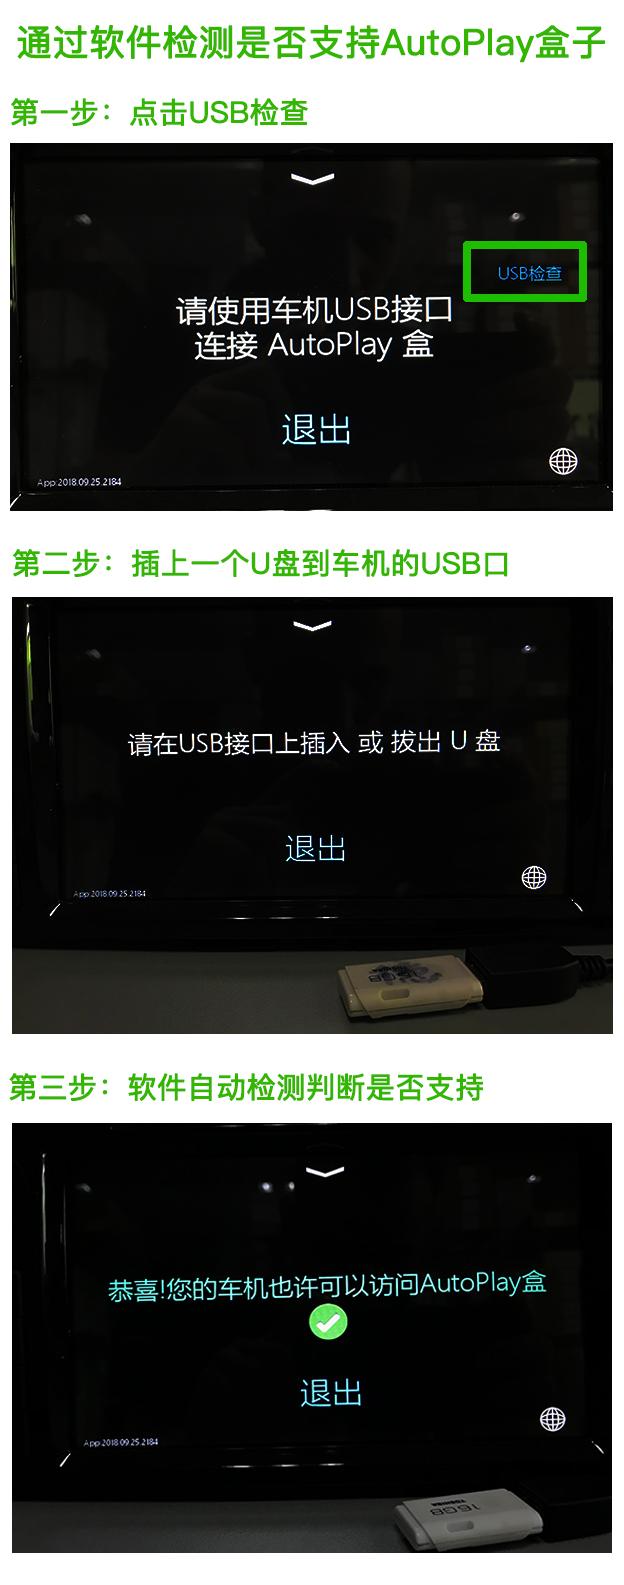 WinCE车机通过USB检查是否支持AutoPlay盒子.jpg